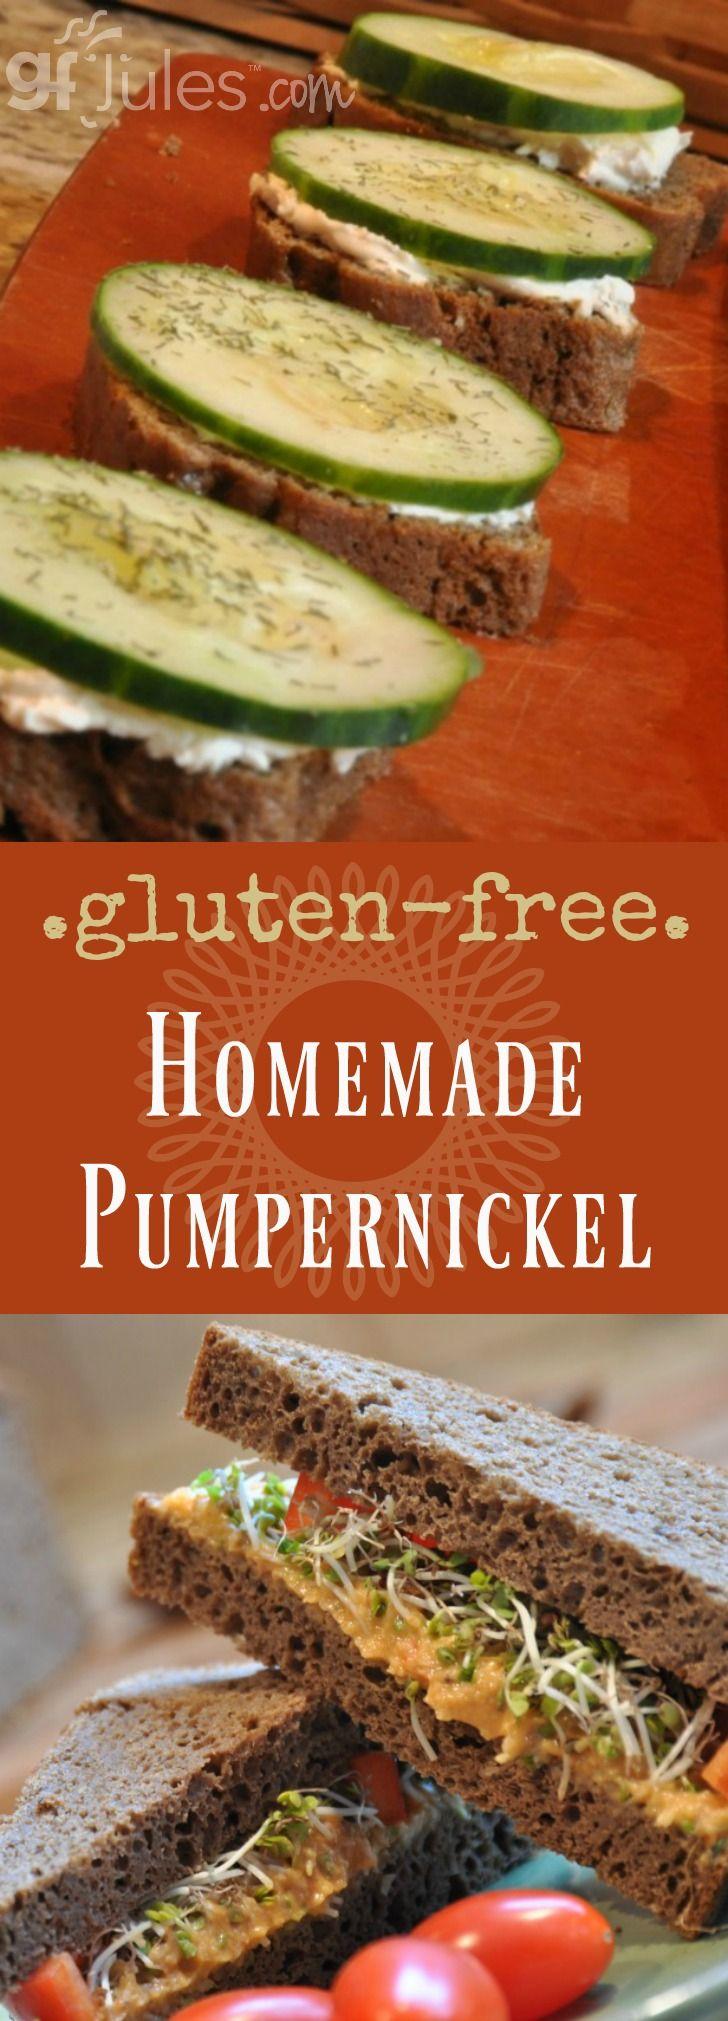 Positively Perfect Gluten Free Pumpernickel Recipe With Images Gluten Free Recipes Gluten Free Recipes Bread Recipes